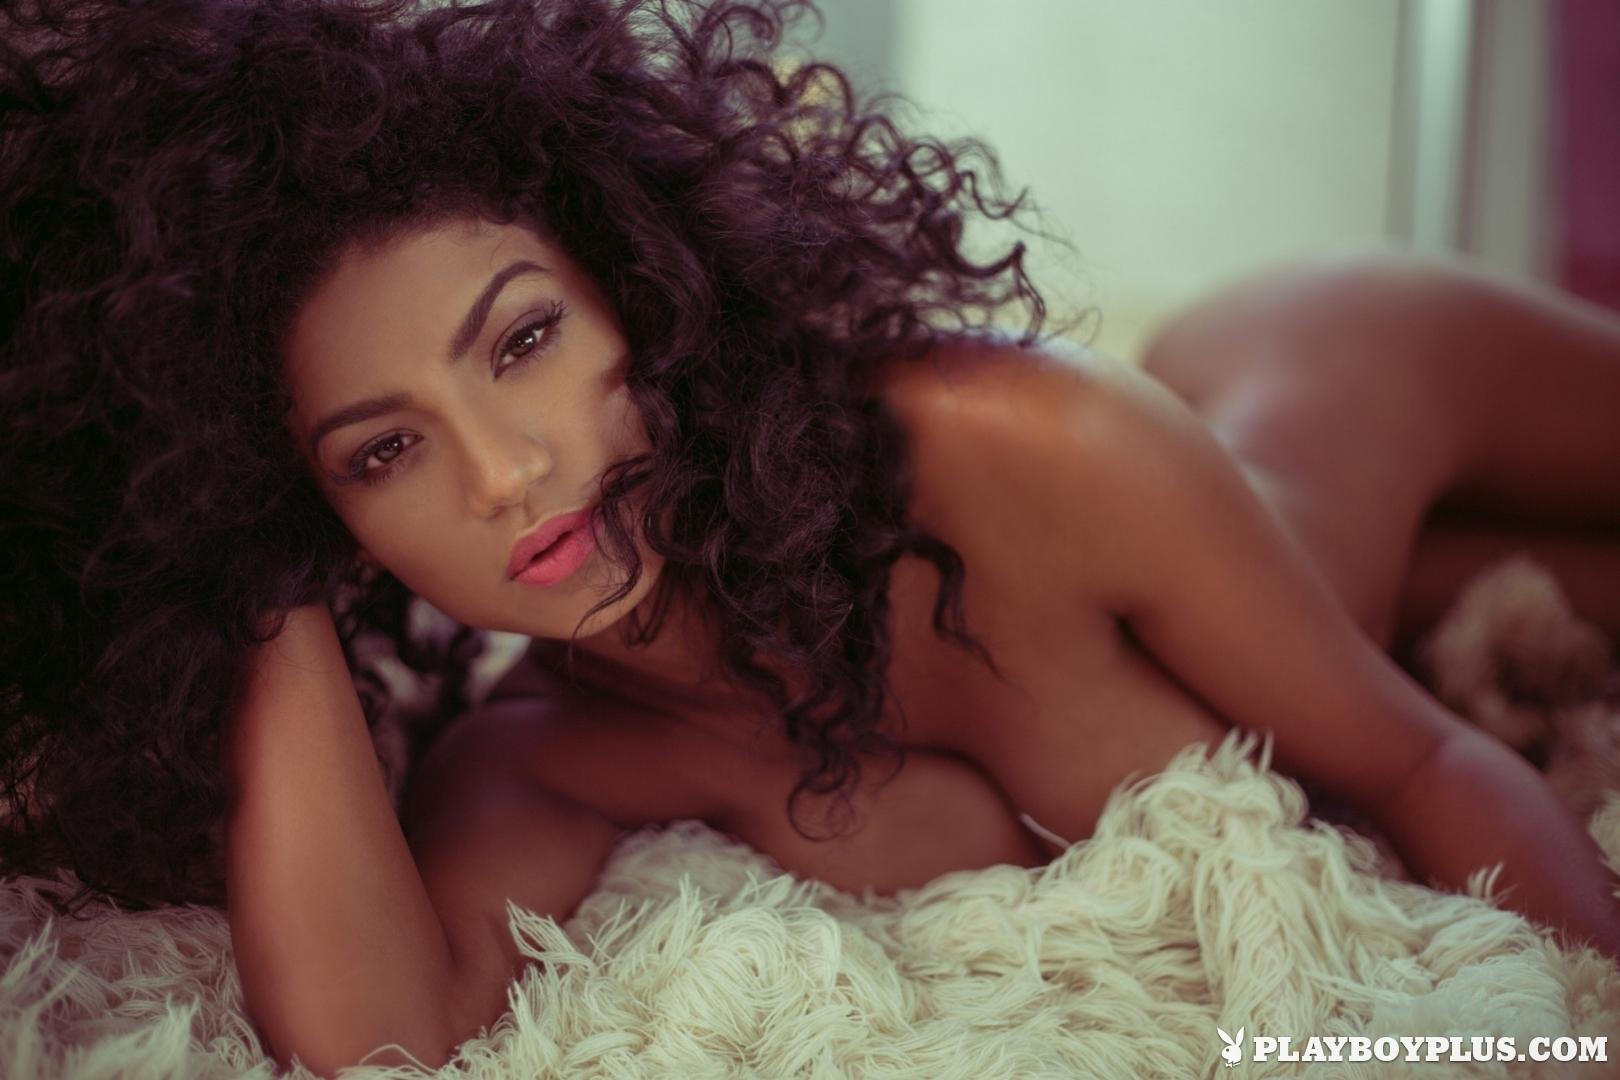 Playboy Plus | Kate Rodriguez in Playboy Argentina 27